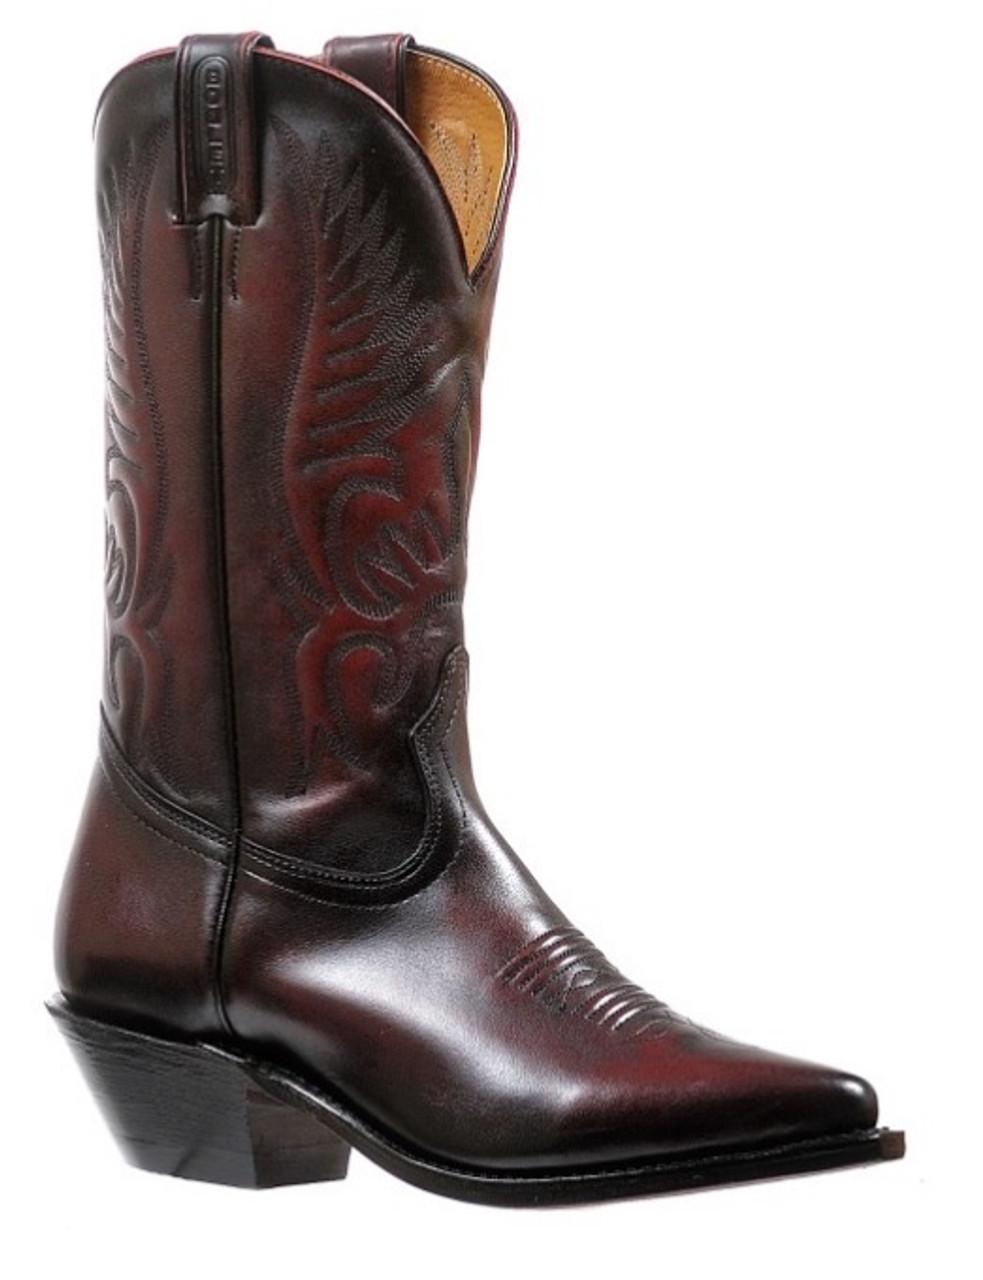 9b957f72d52 Women's Boulet Black Cherry Snip Toe Western Boot